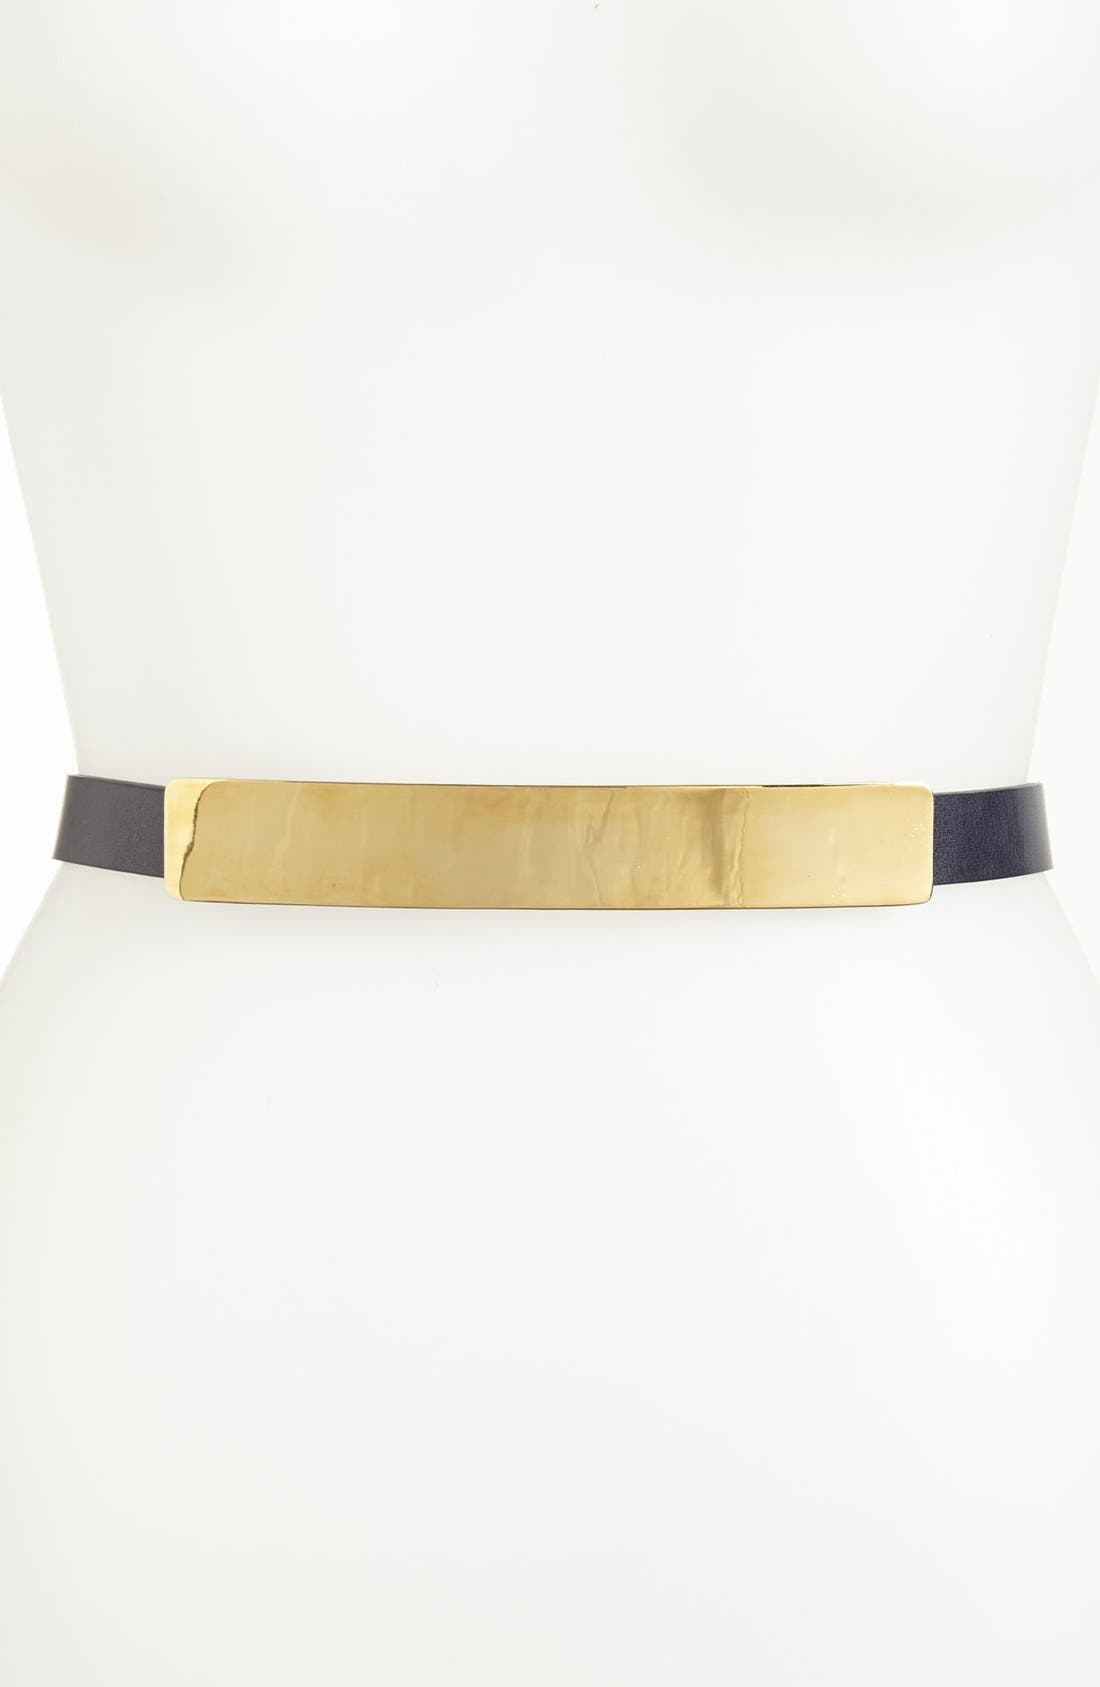 Alternate Image 1 Selected - St. John Collection Light Gold Buckle Leather Belt